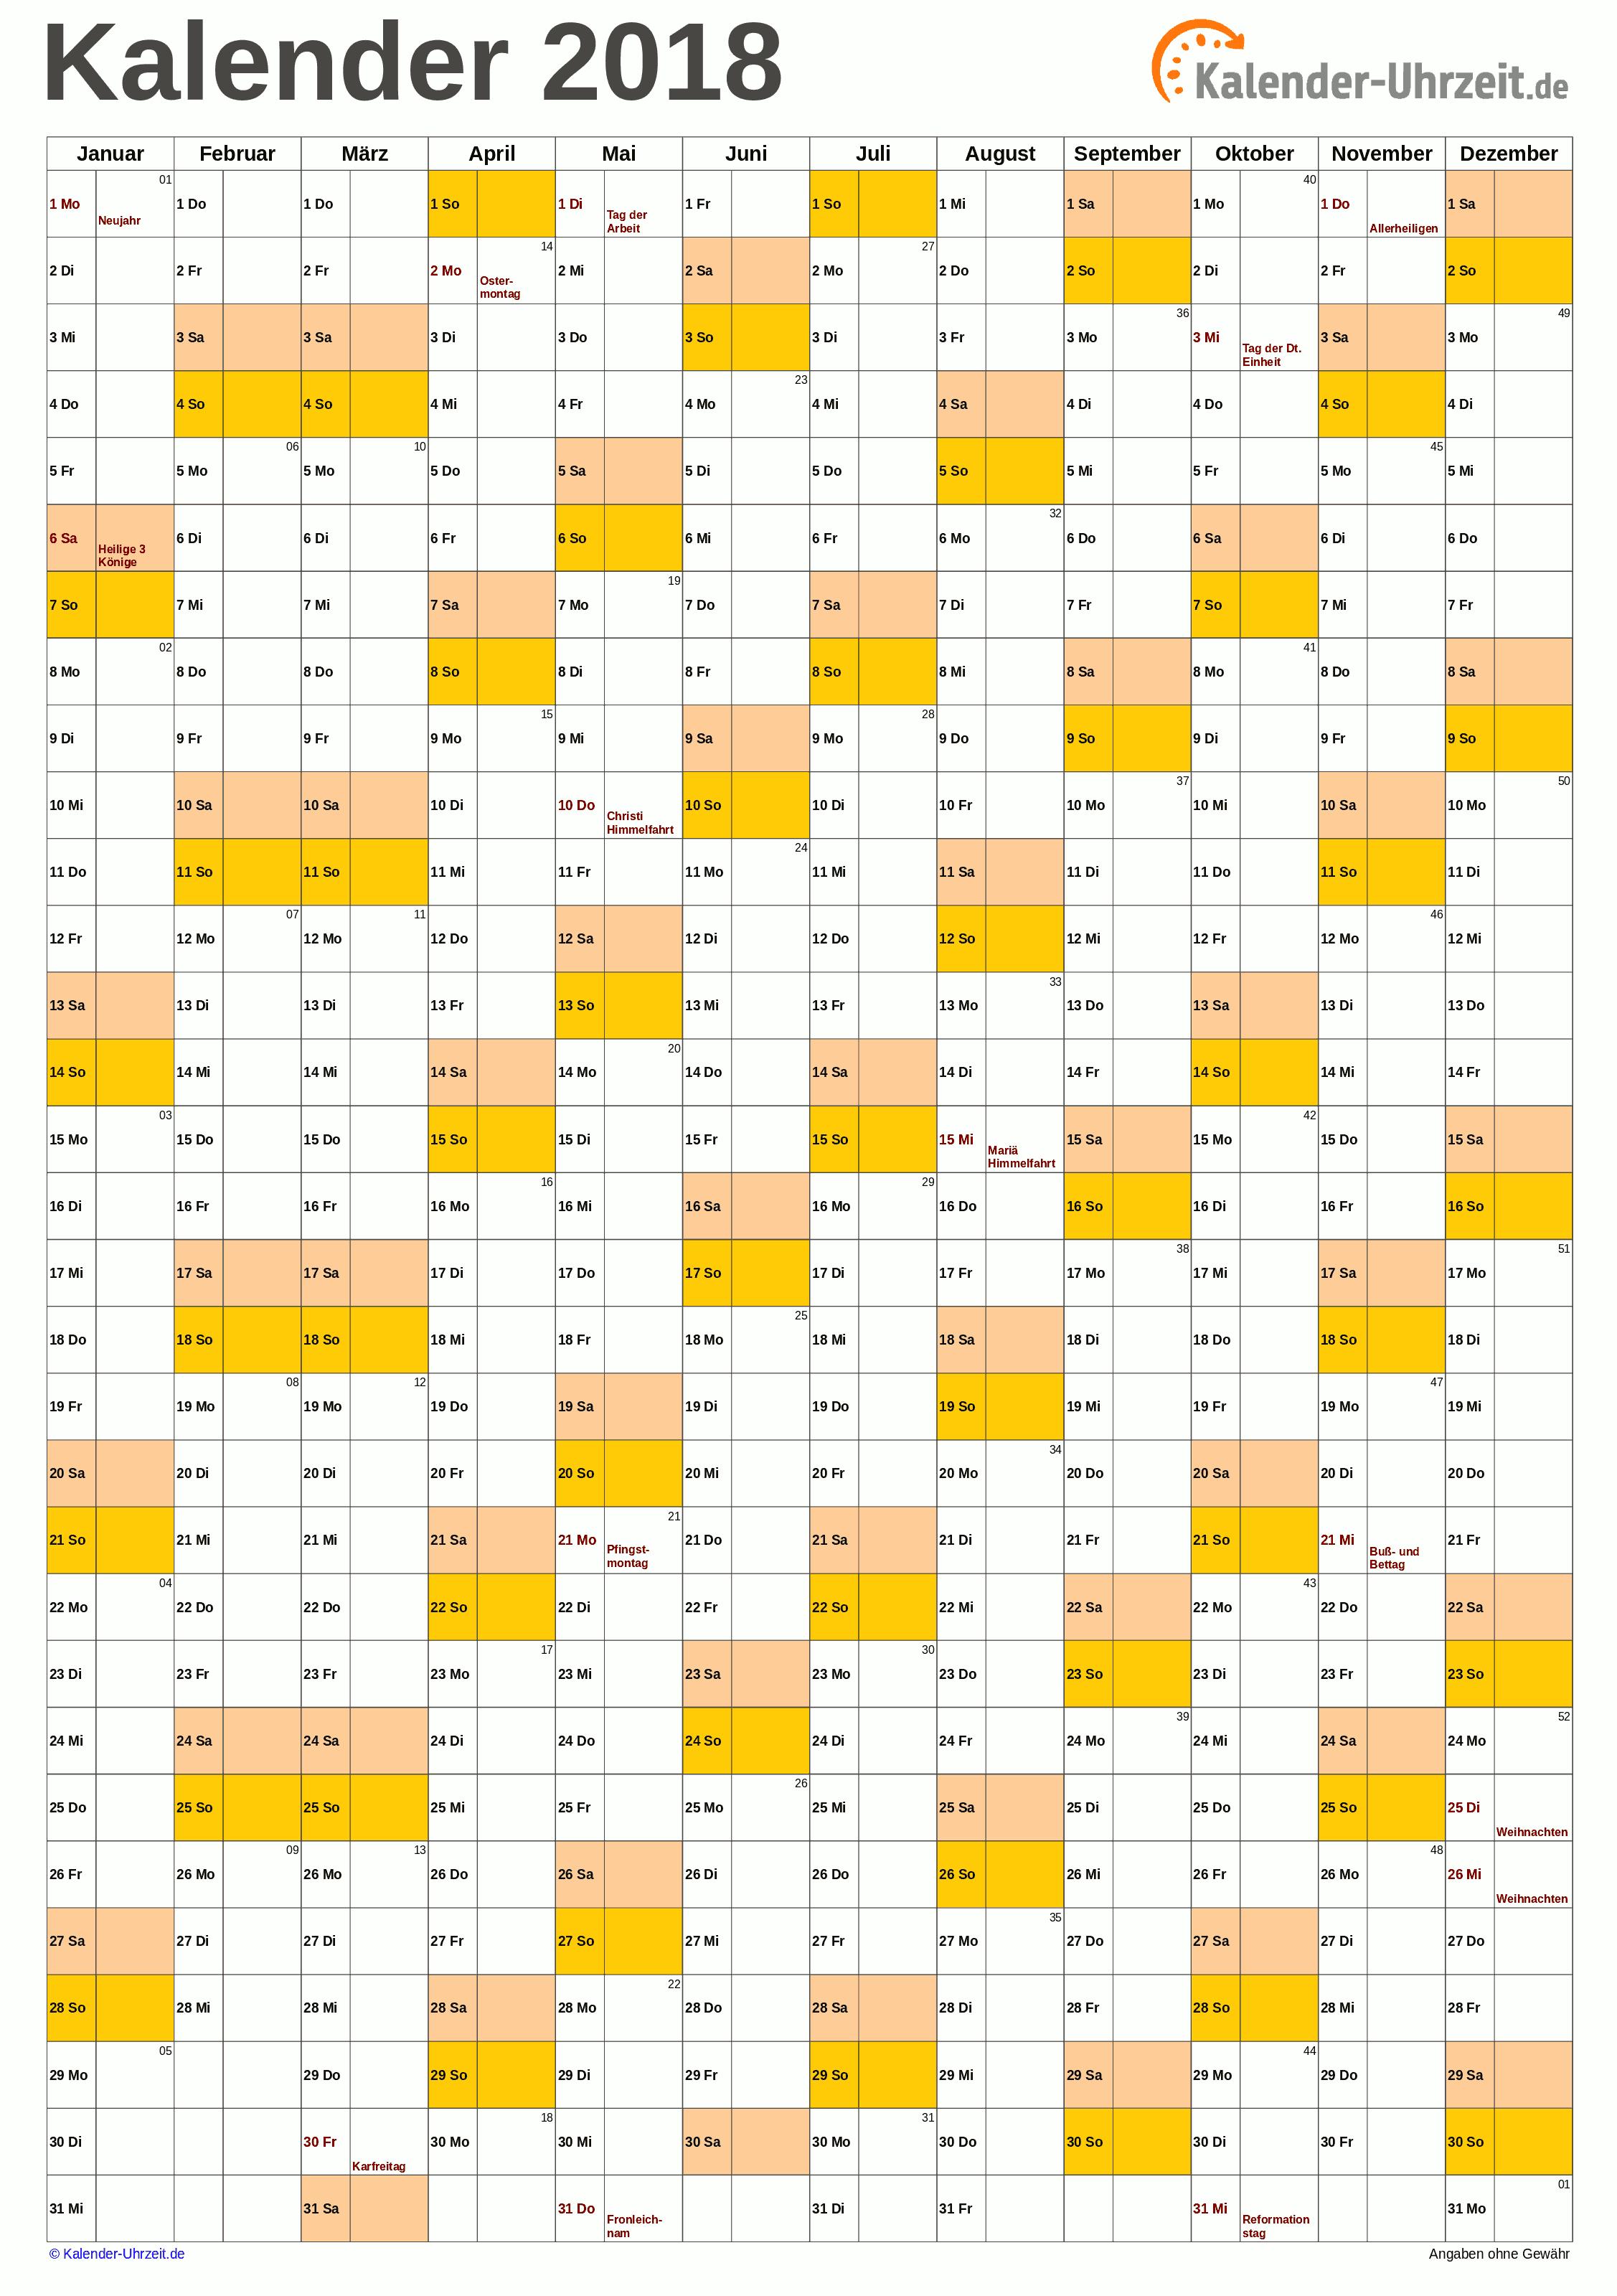 Wunderbar Monatliche Kalendervorlagen Bilder - Entry Level Resume ...